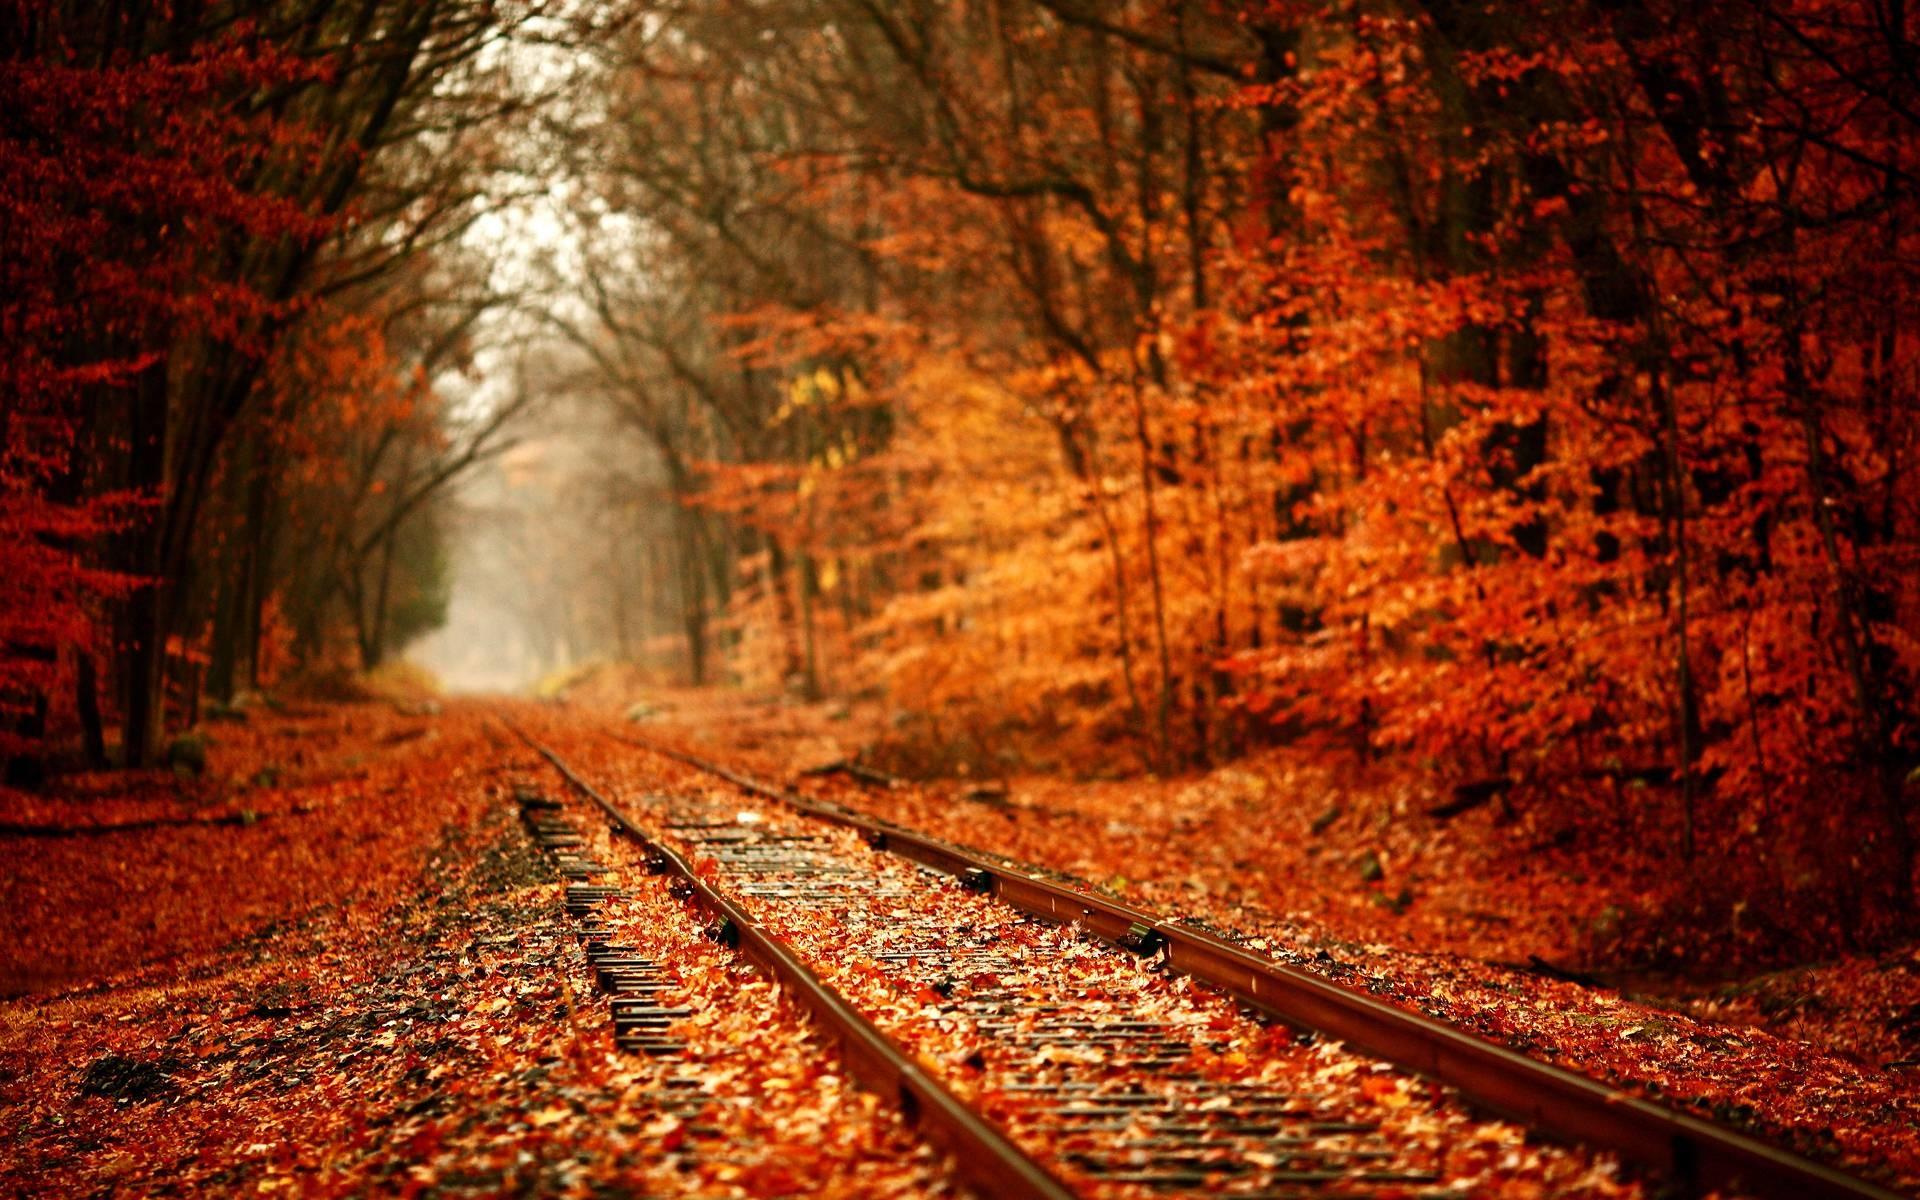 Fall Foliage Wallpaper Widescreen Desktop Wallpaper Autumn Leaves 65 Images